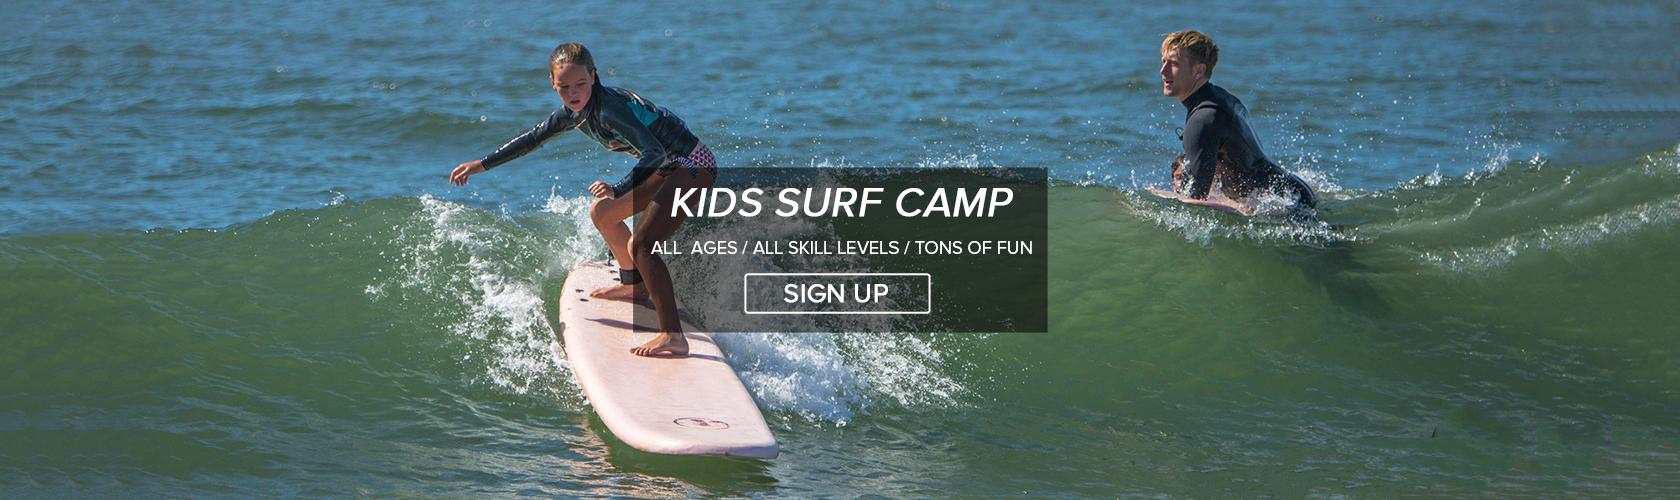 Kids Surf Camp Slider 2018.jpg